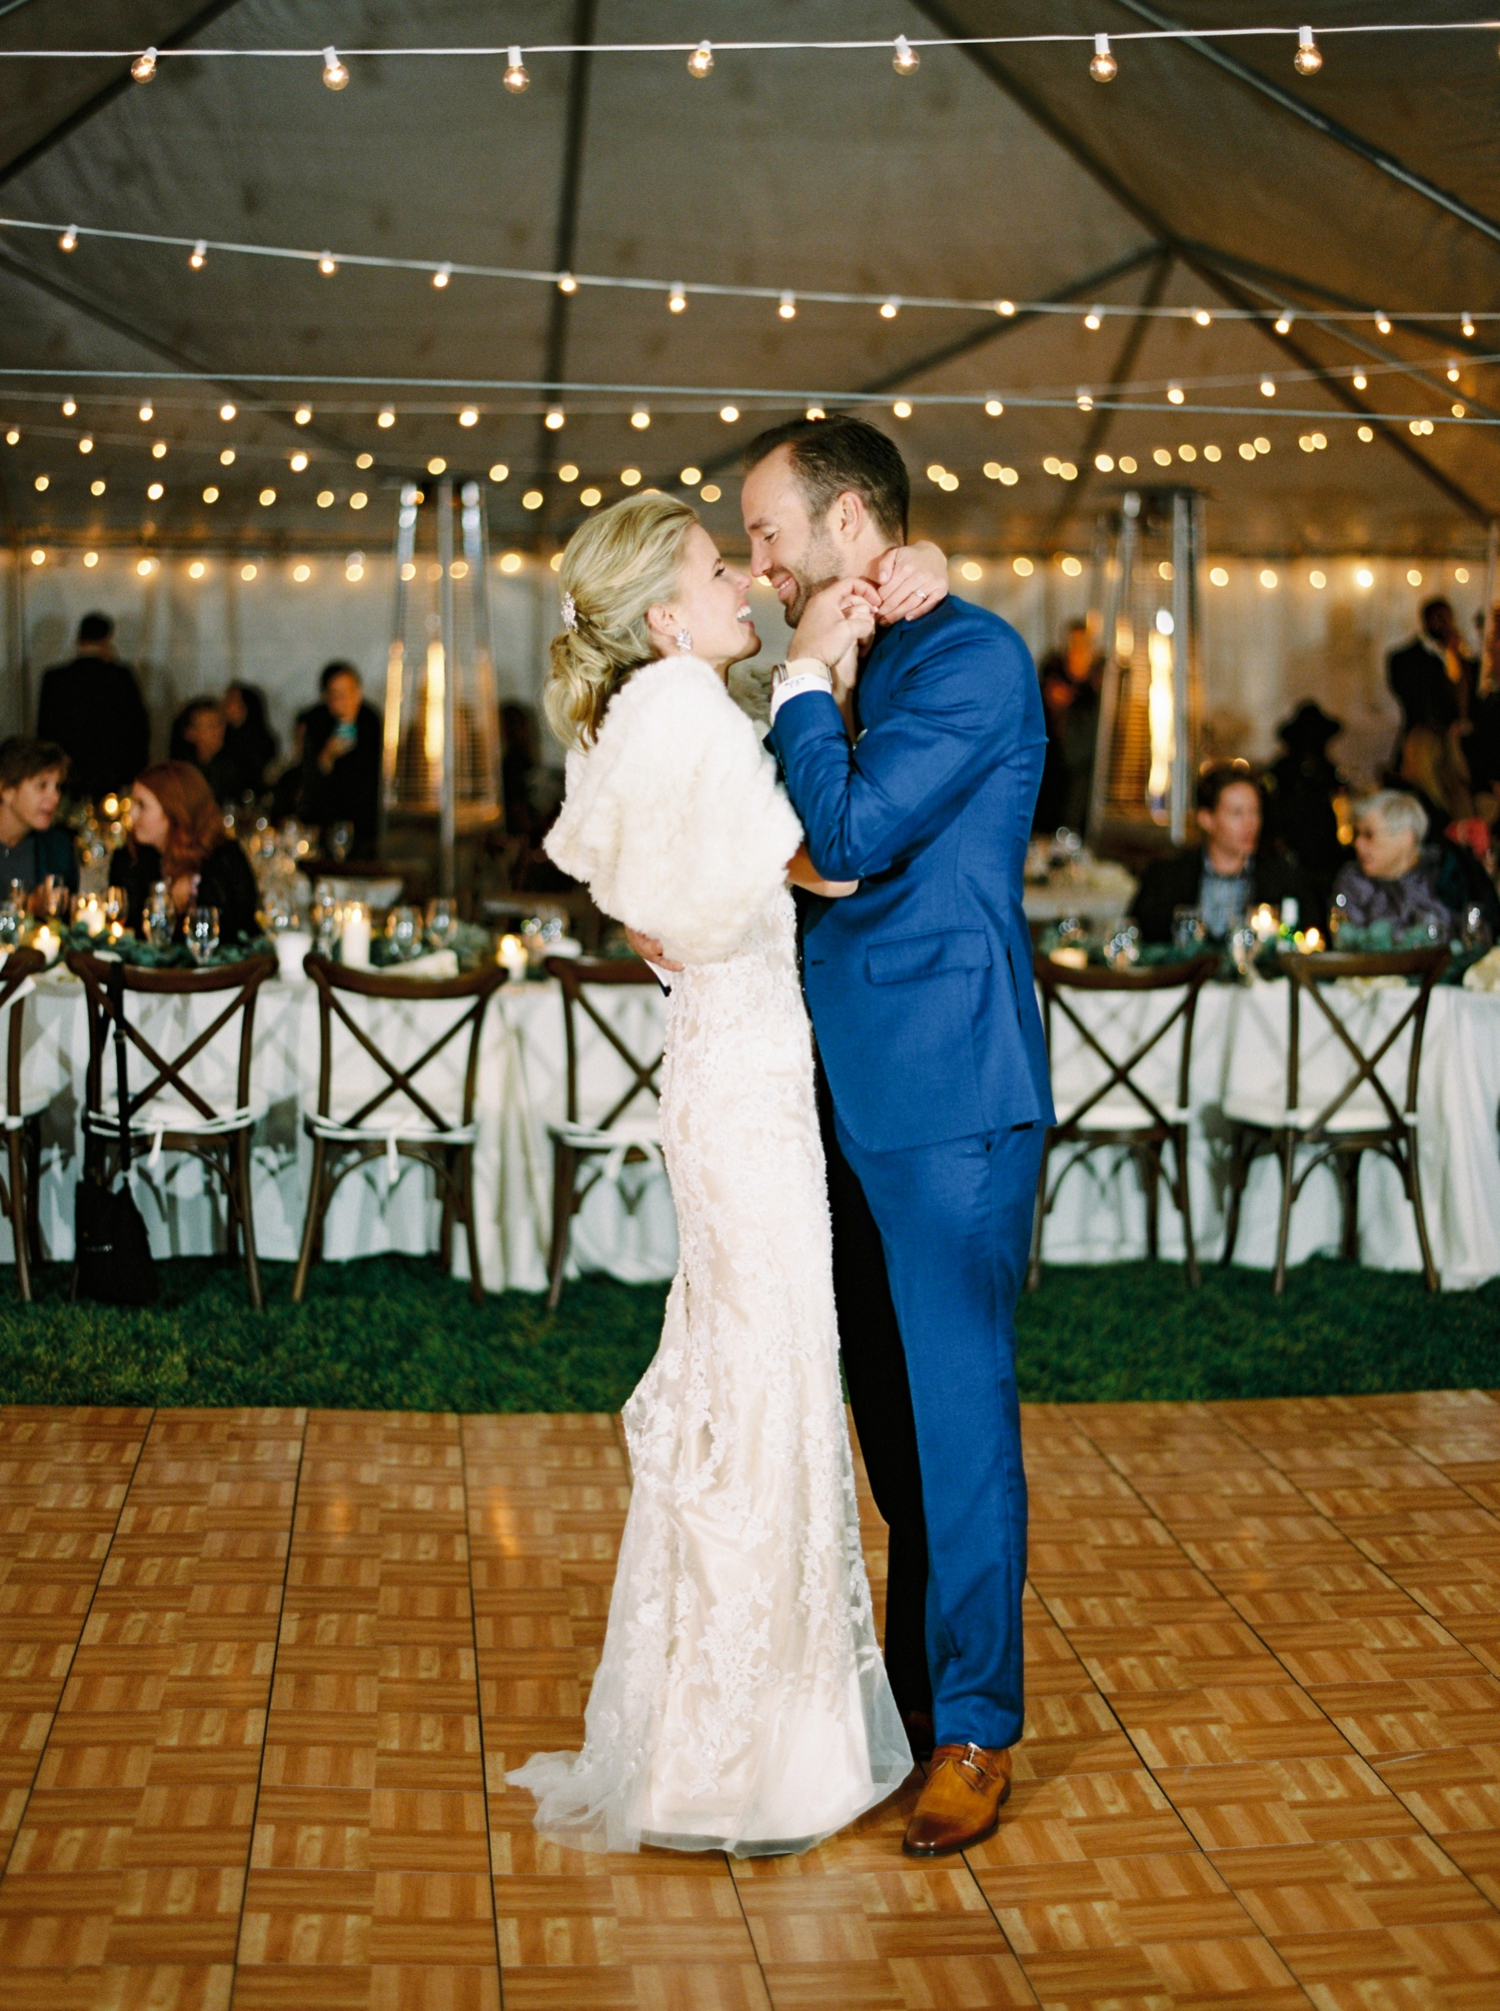 Calgary wedding photographers | oregon wedding photographers | fine art film | Justine Milton Photography | oregon wedding | wedding reception | wedding details | bride and groom | first dance